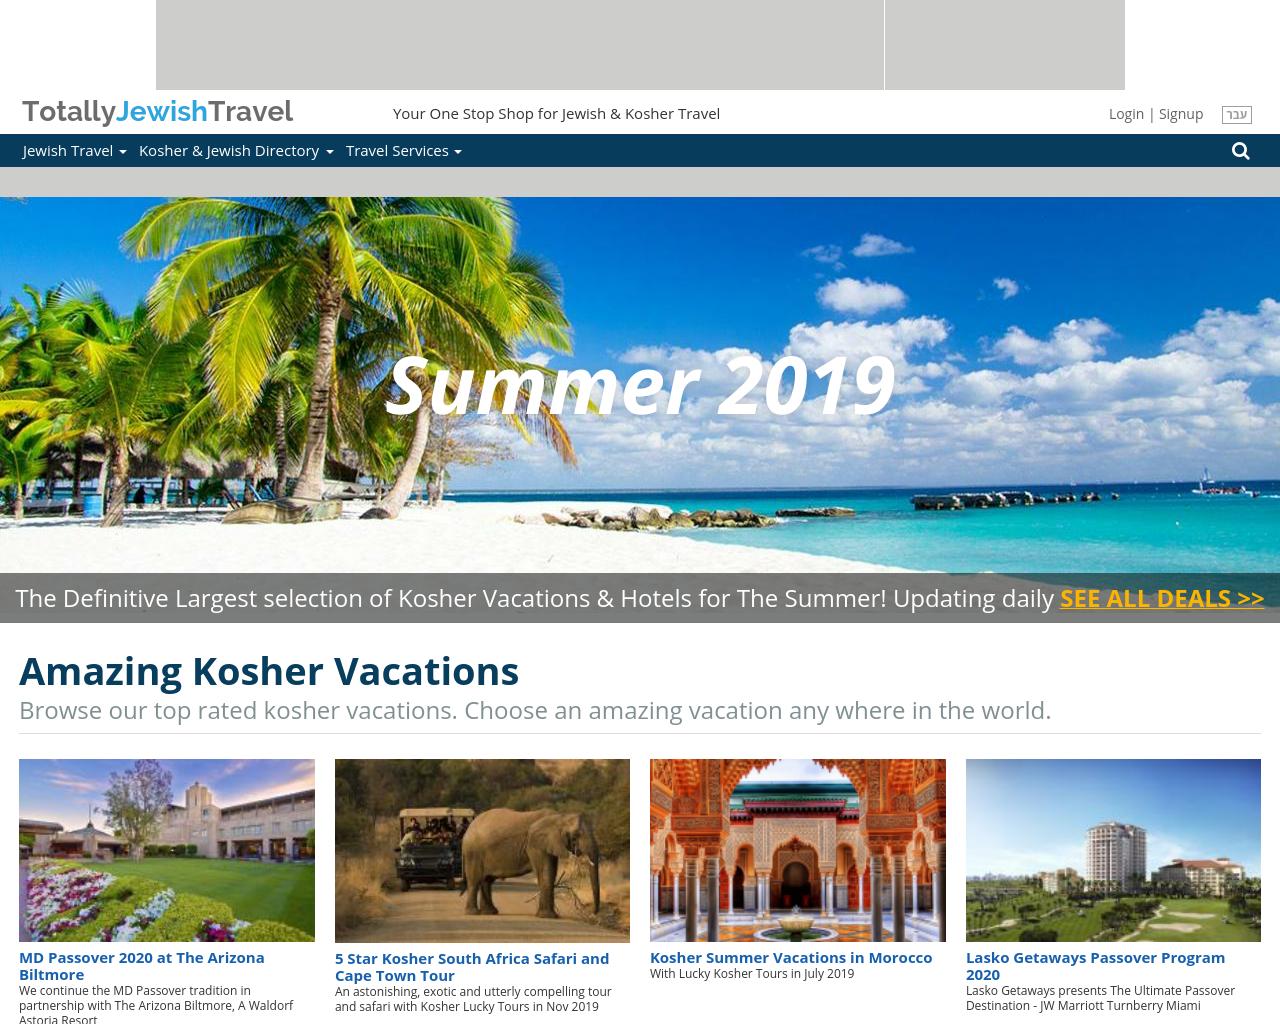 Totally Jewish Travel Advertising Mediakits, Reviews, Pricing